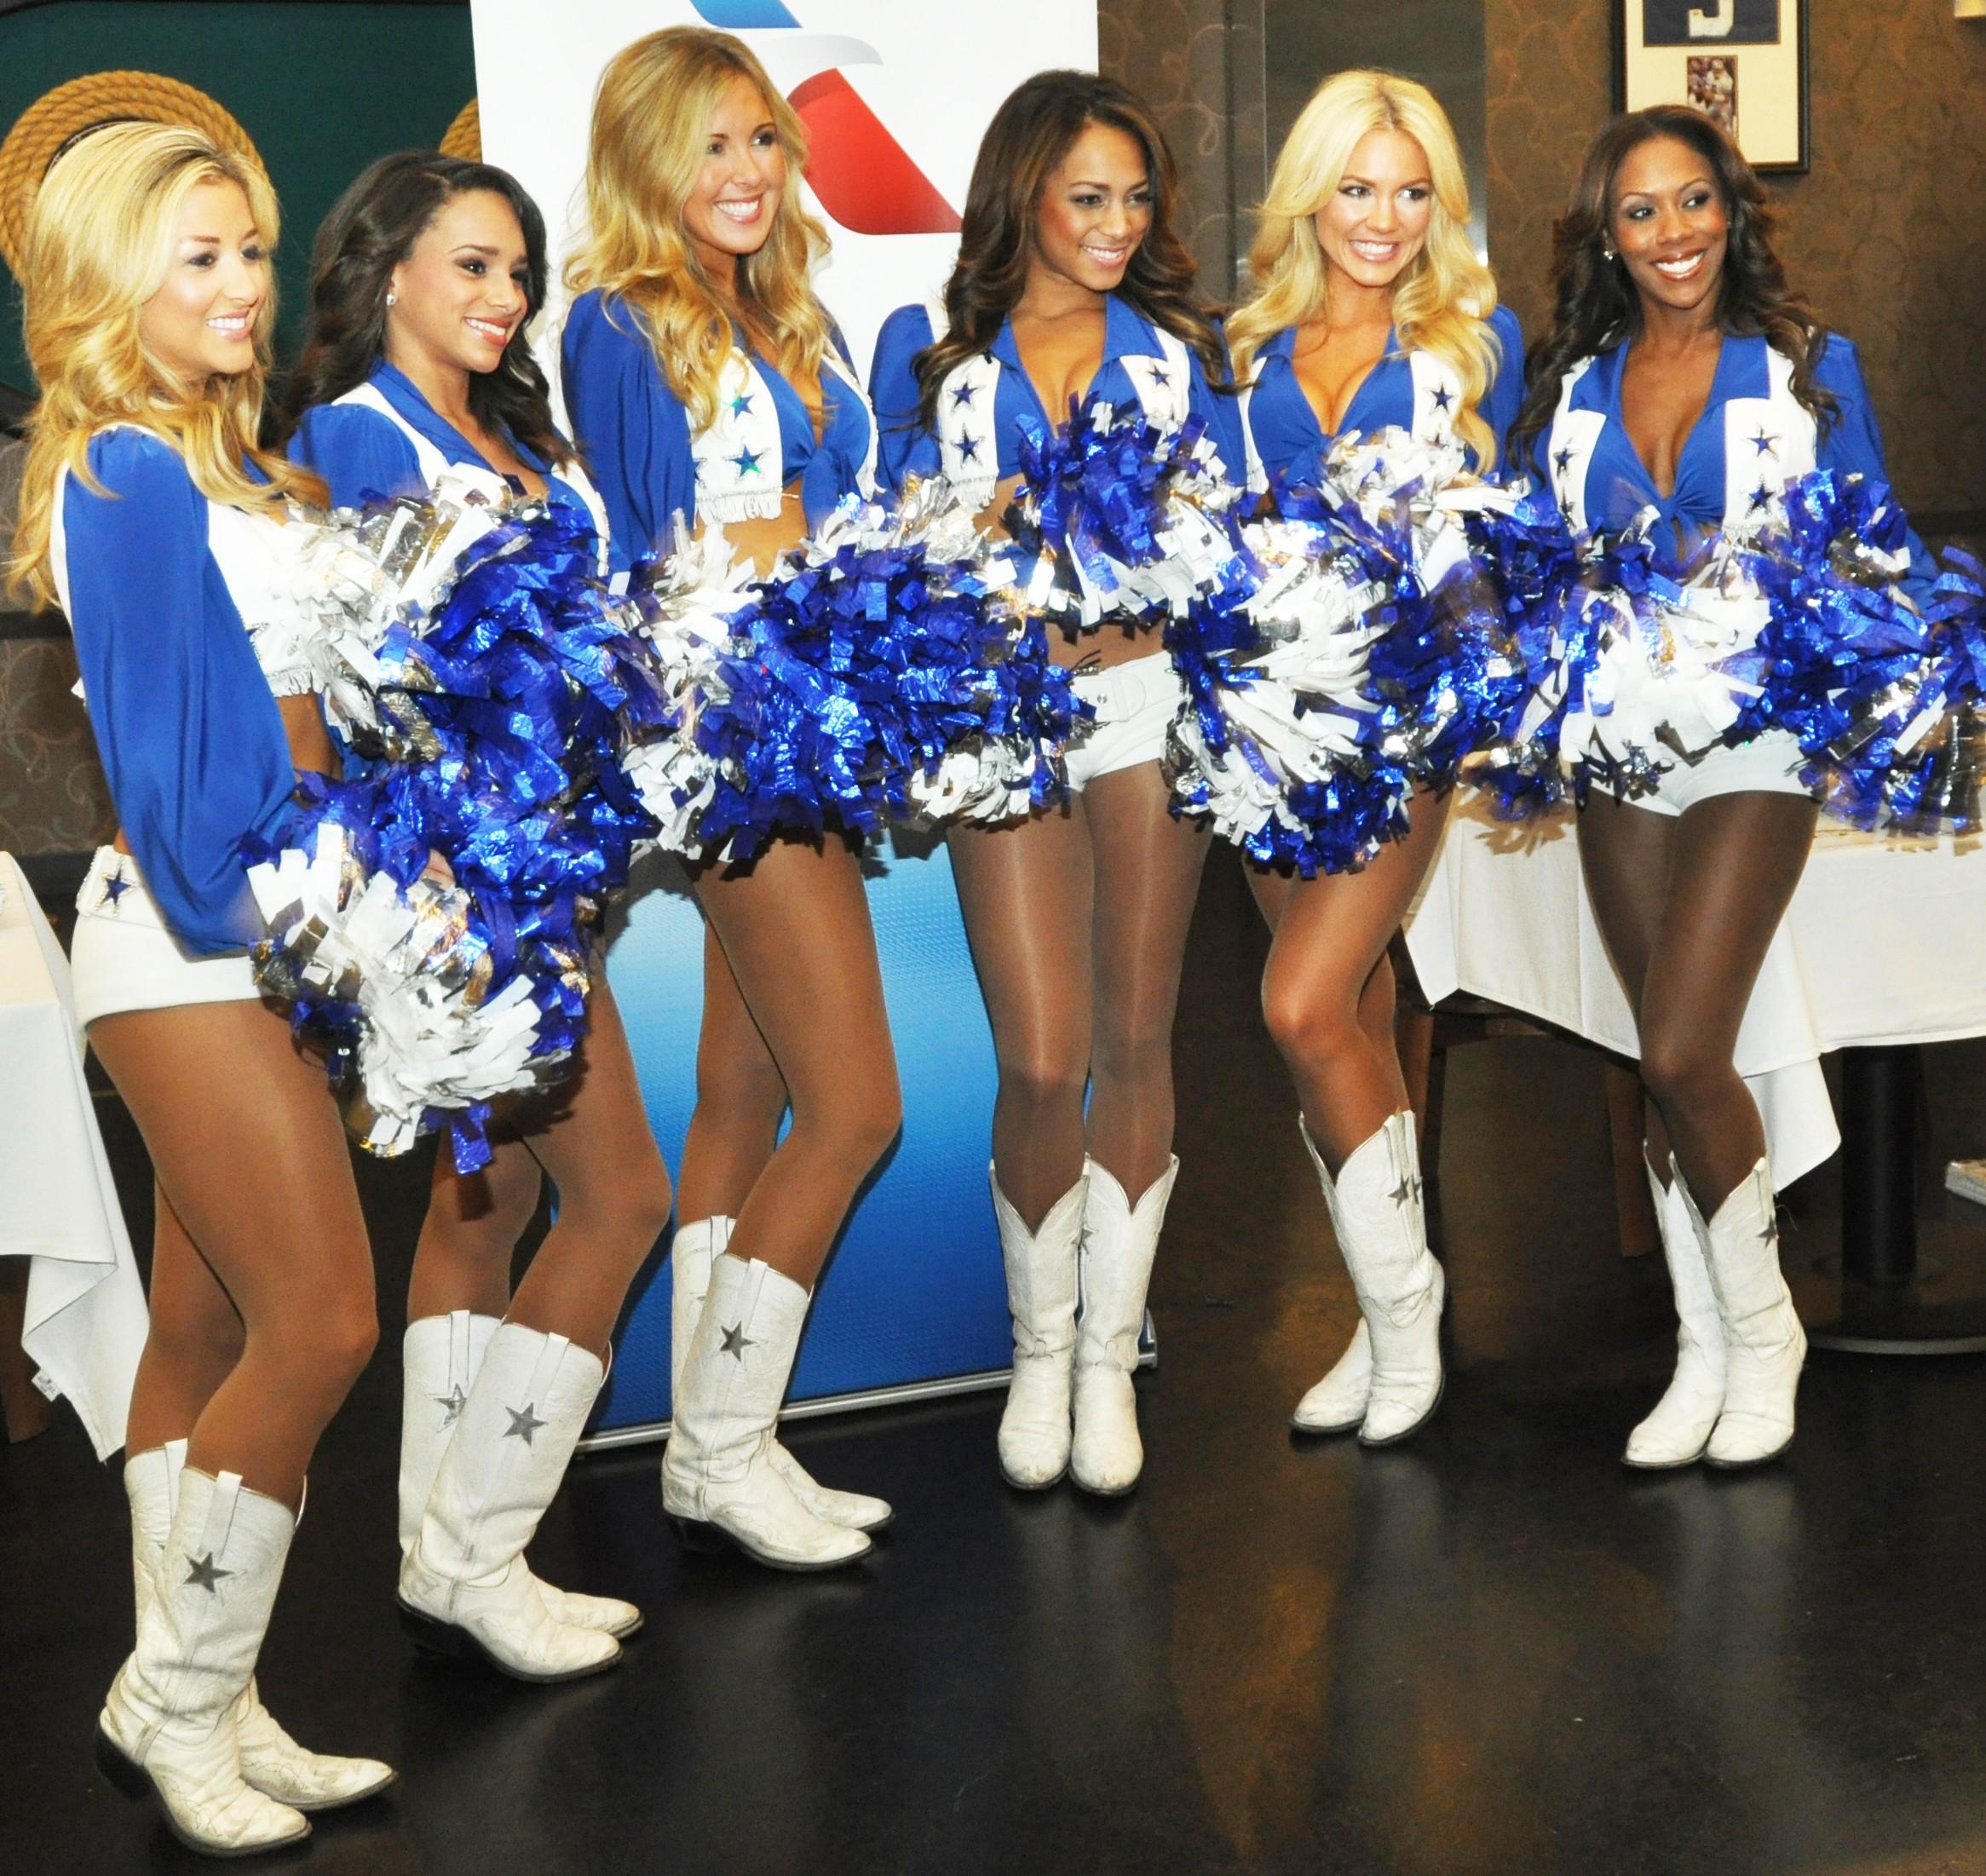 Dallas cowboys cheerleaders thank yongsan troops article the original m4hsunfo